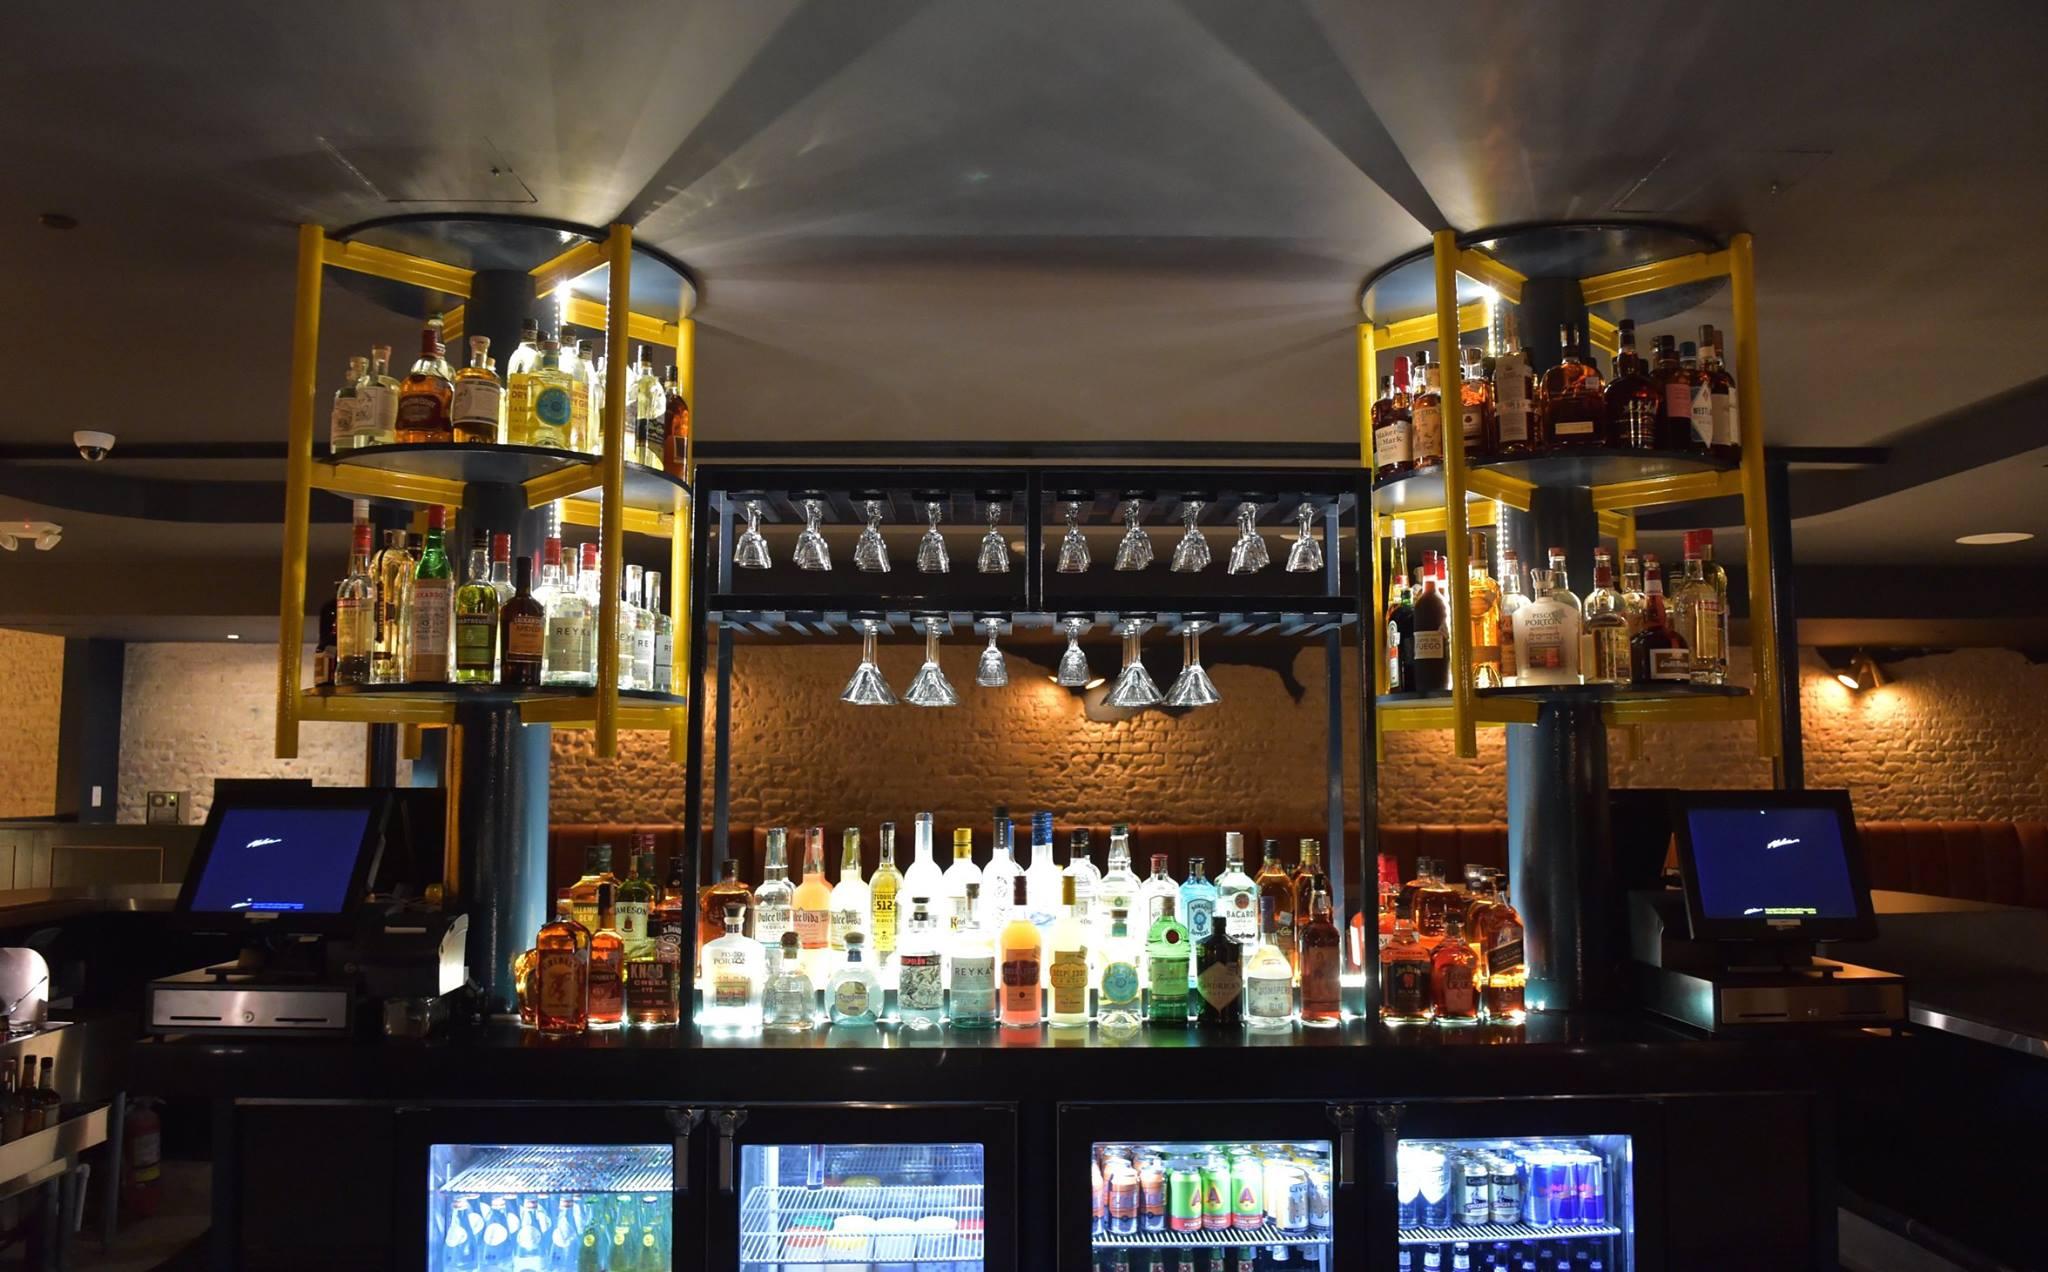 The bar at Sellers